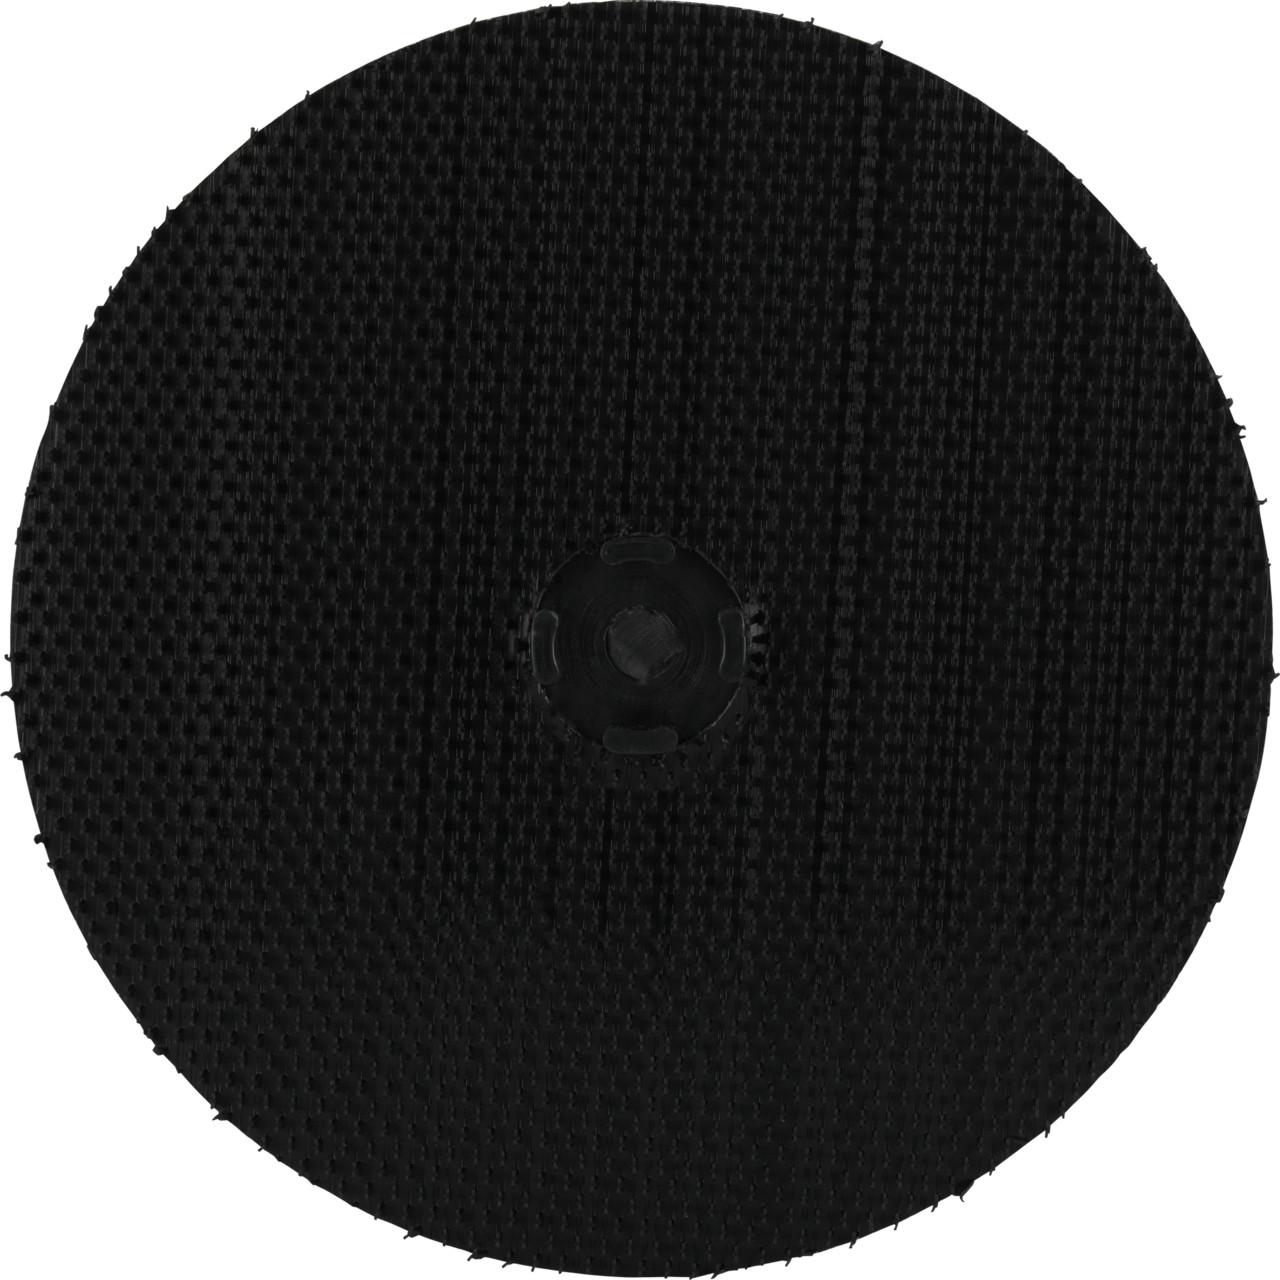 Immagine di Rondelle di spessore PREMIUM*** per dischi SCM